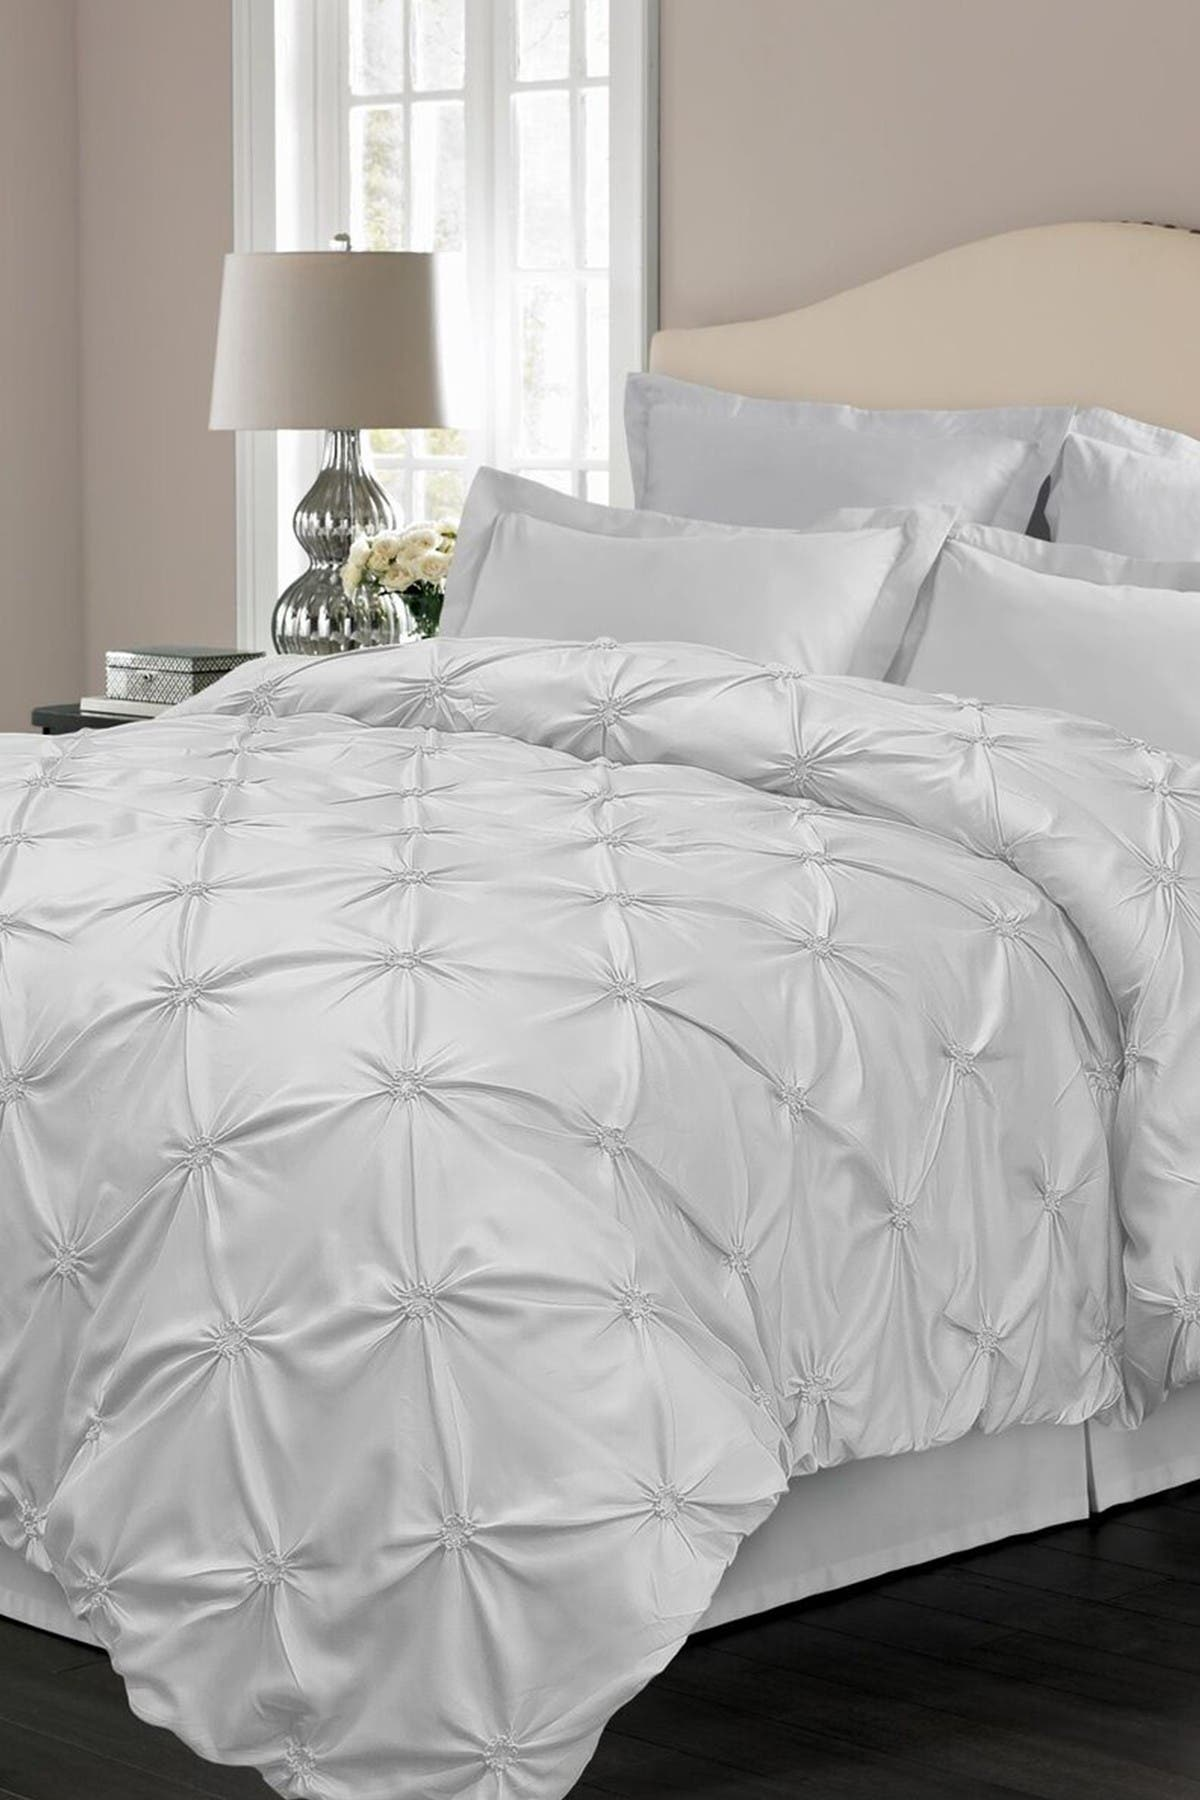 Blue Ridge Home Fashions Oversize Floral Pintuck Microfiber Duvet Cover Set King White Nordstrom Rack